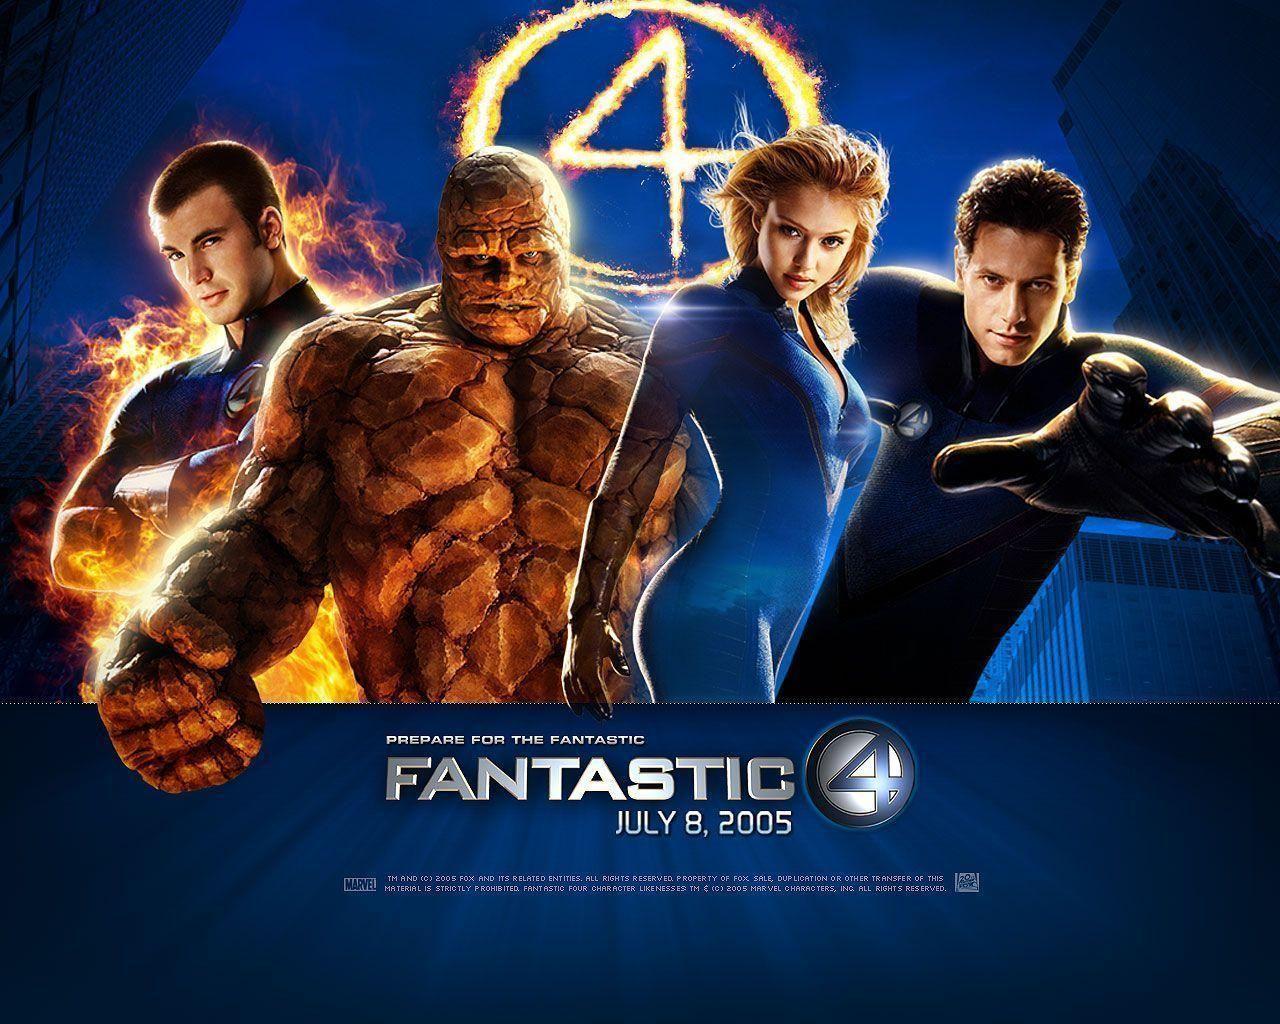 Fantastic Four Wallpaper Hd Fantastic Four Film Manusia